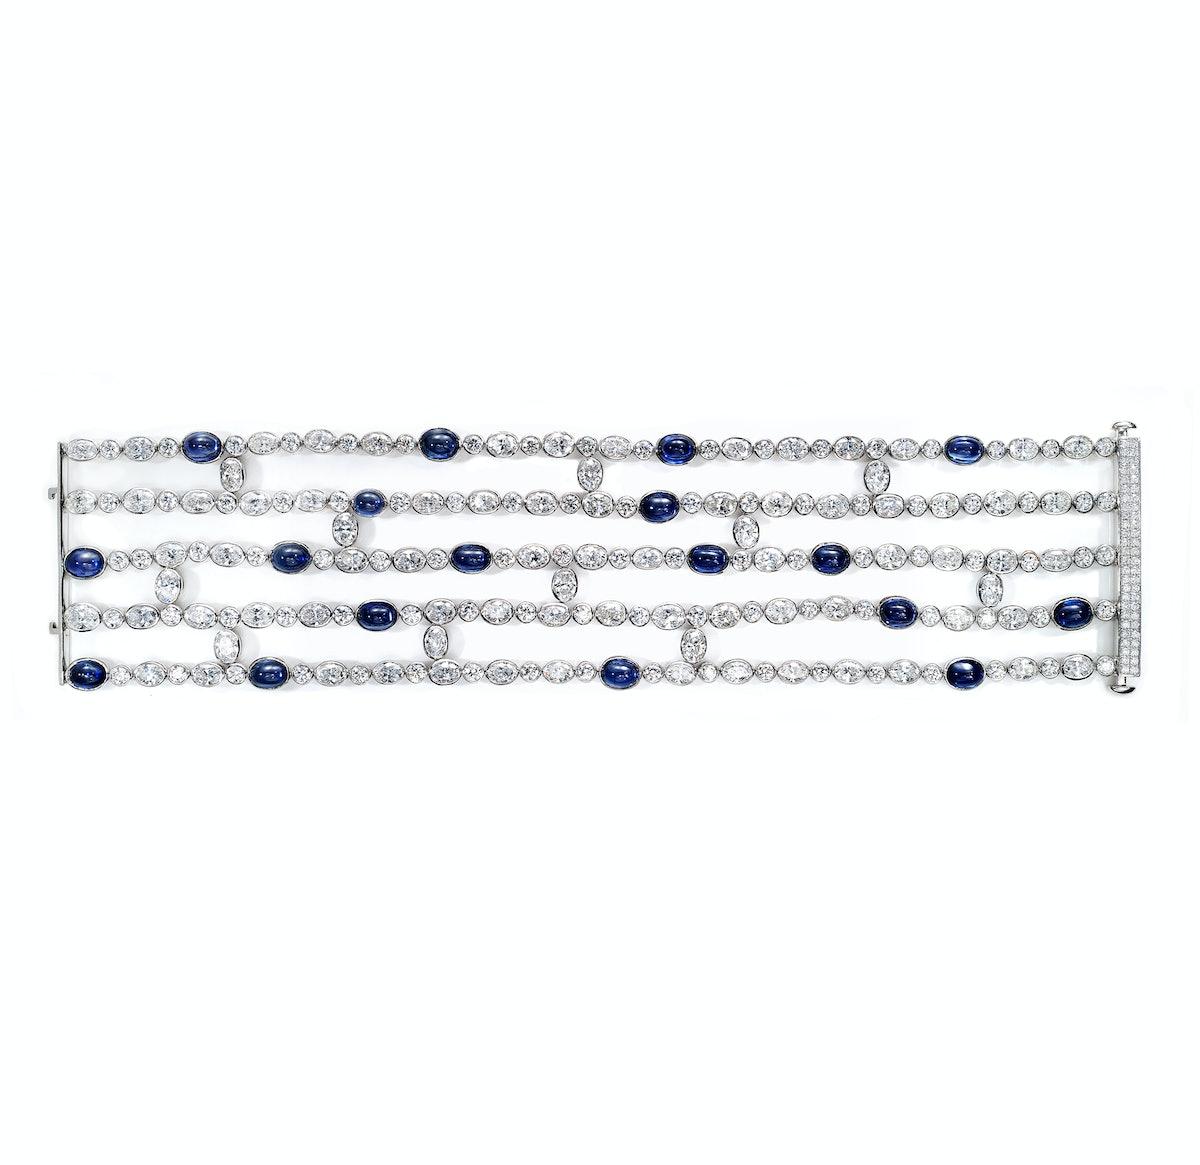 Leviev platinum, sapphire, and diamond bracelet